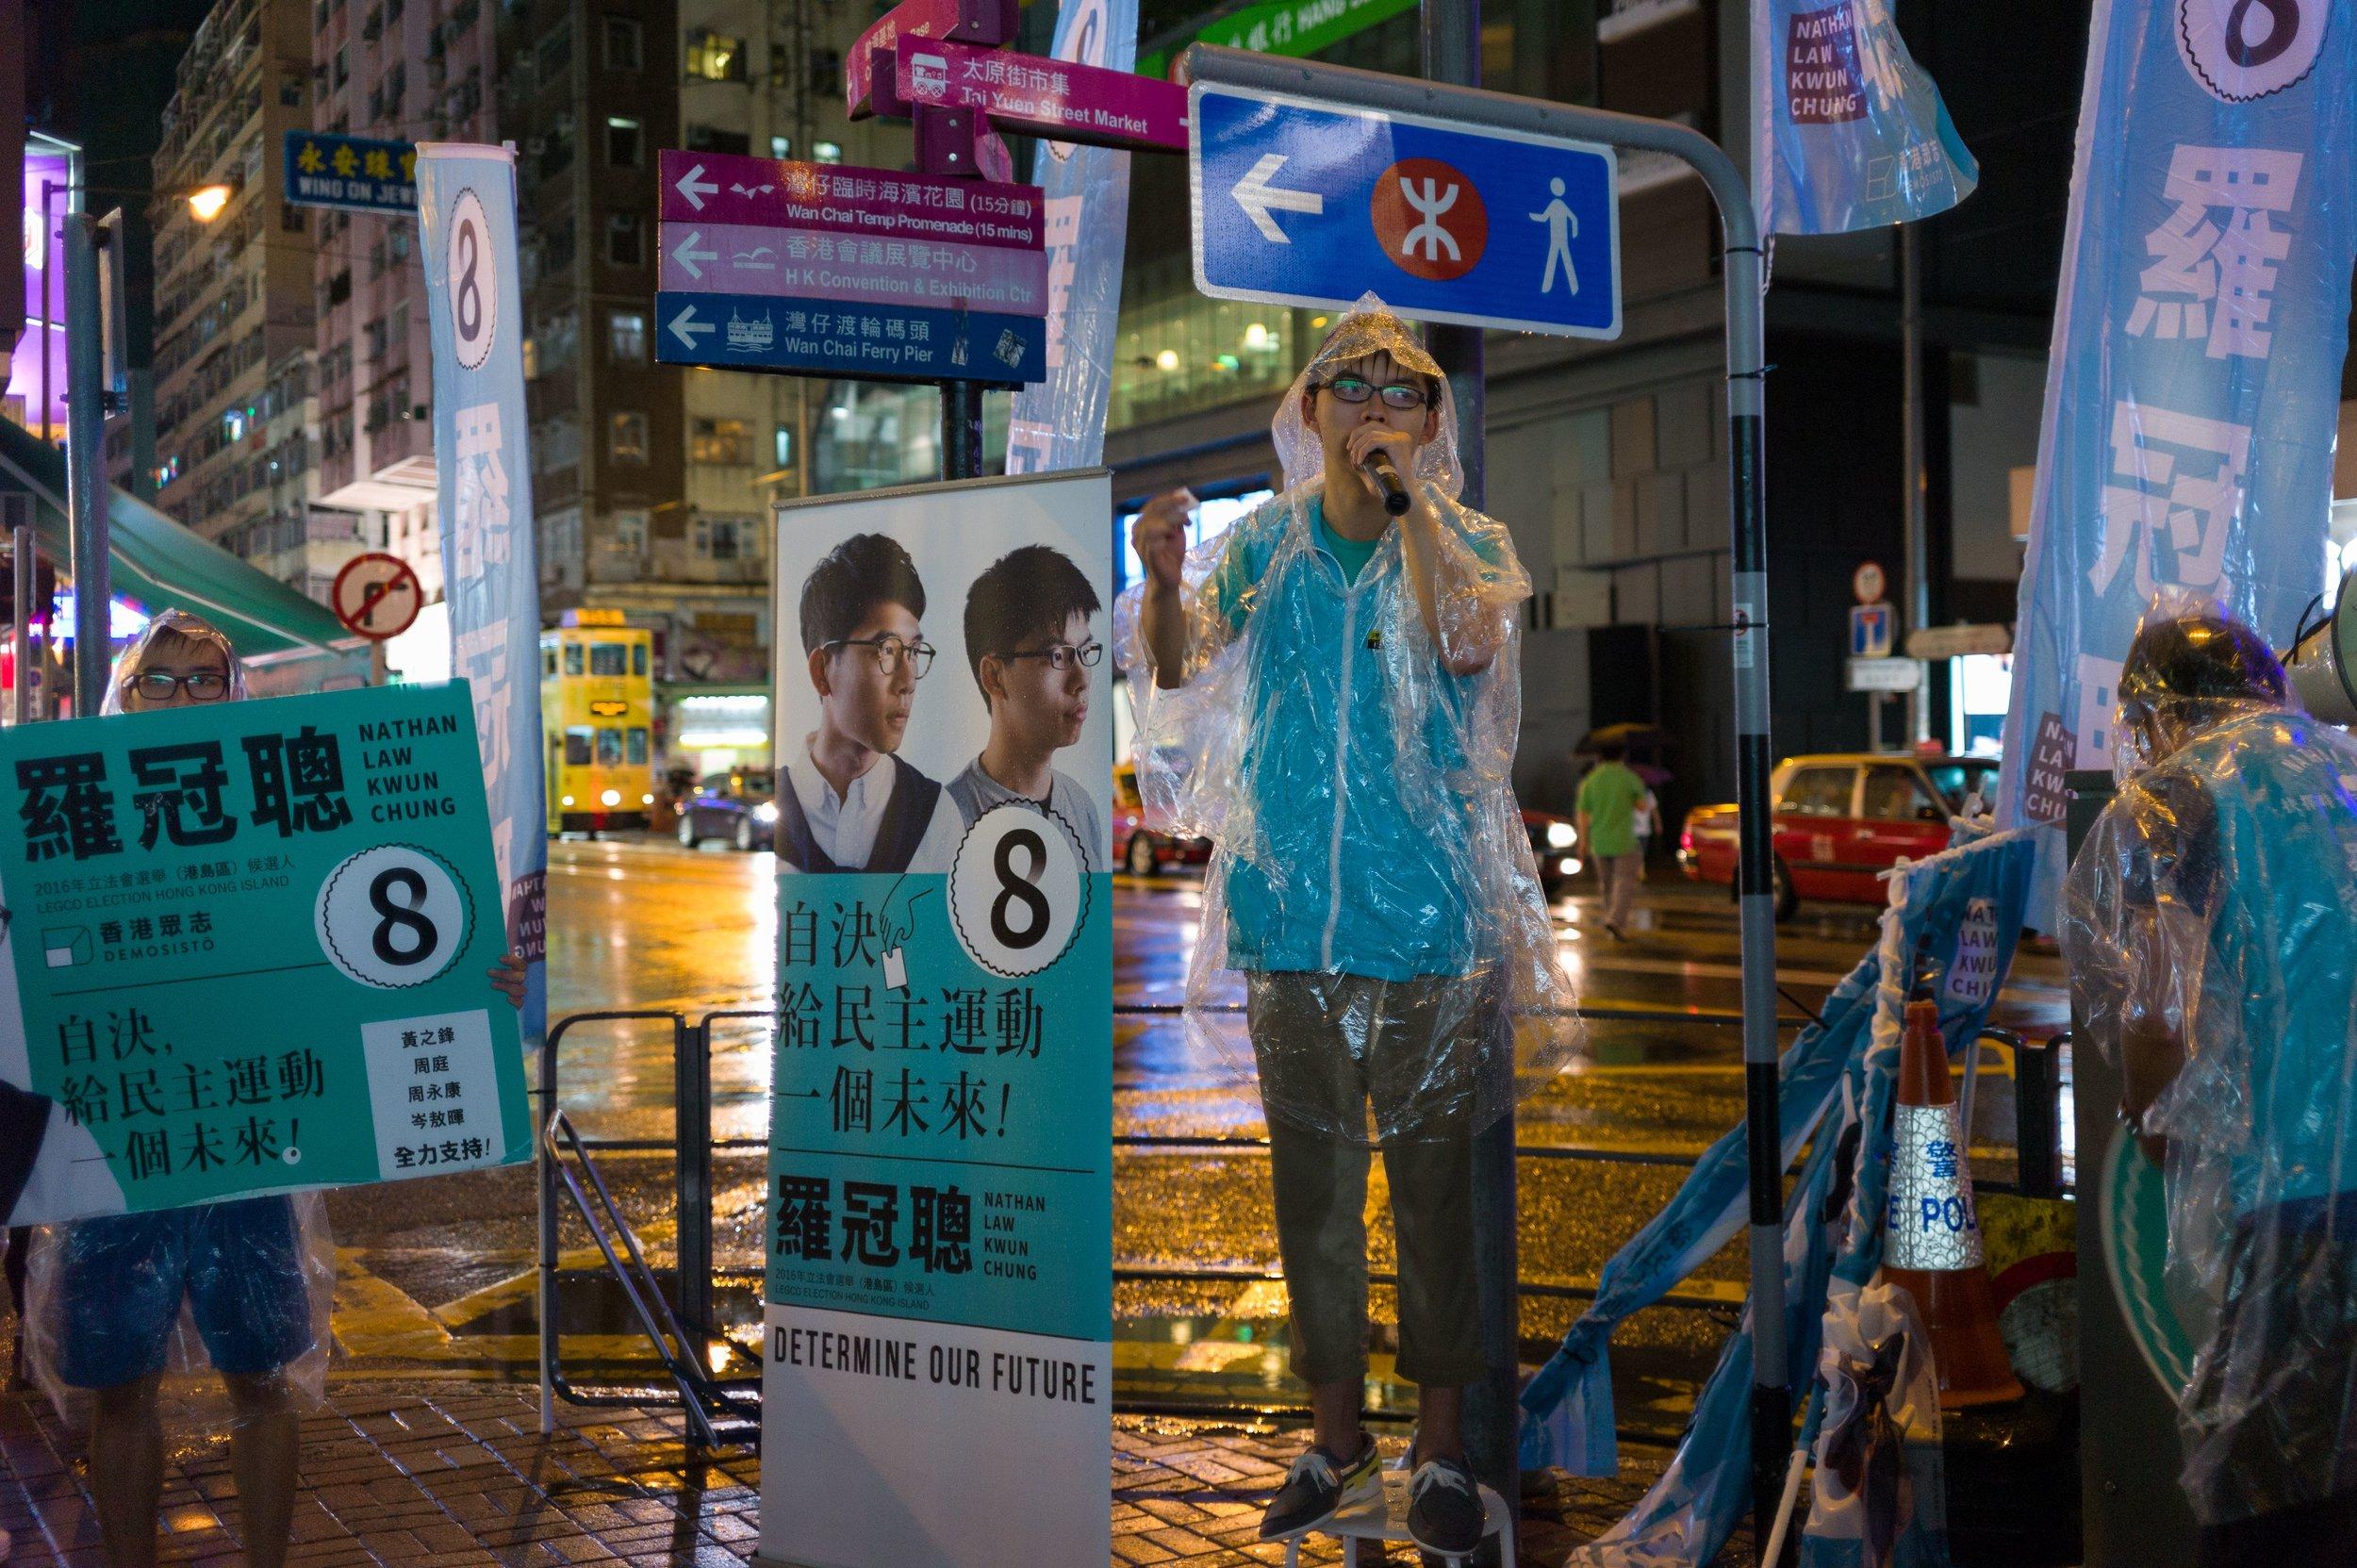 Joshua Wong: Pro-democracy protestor